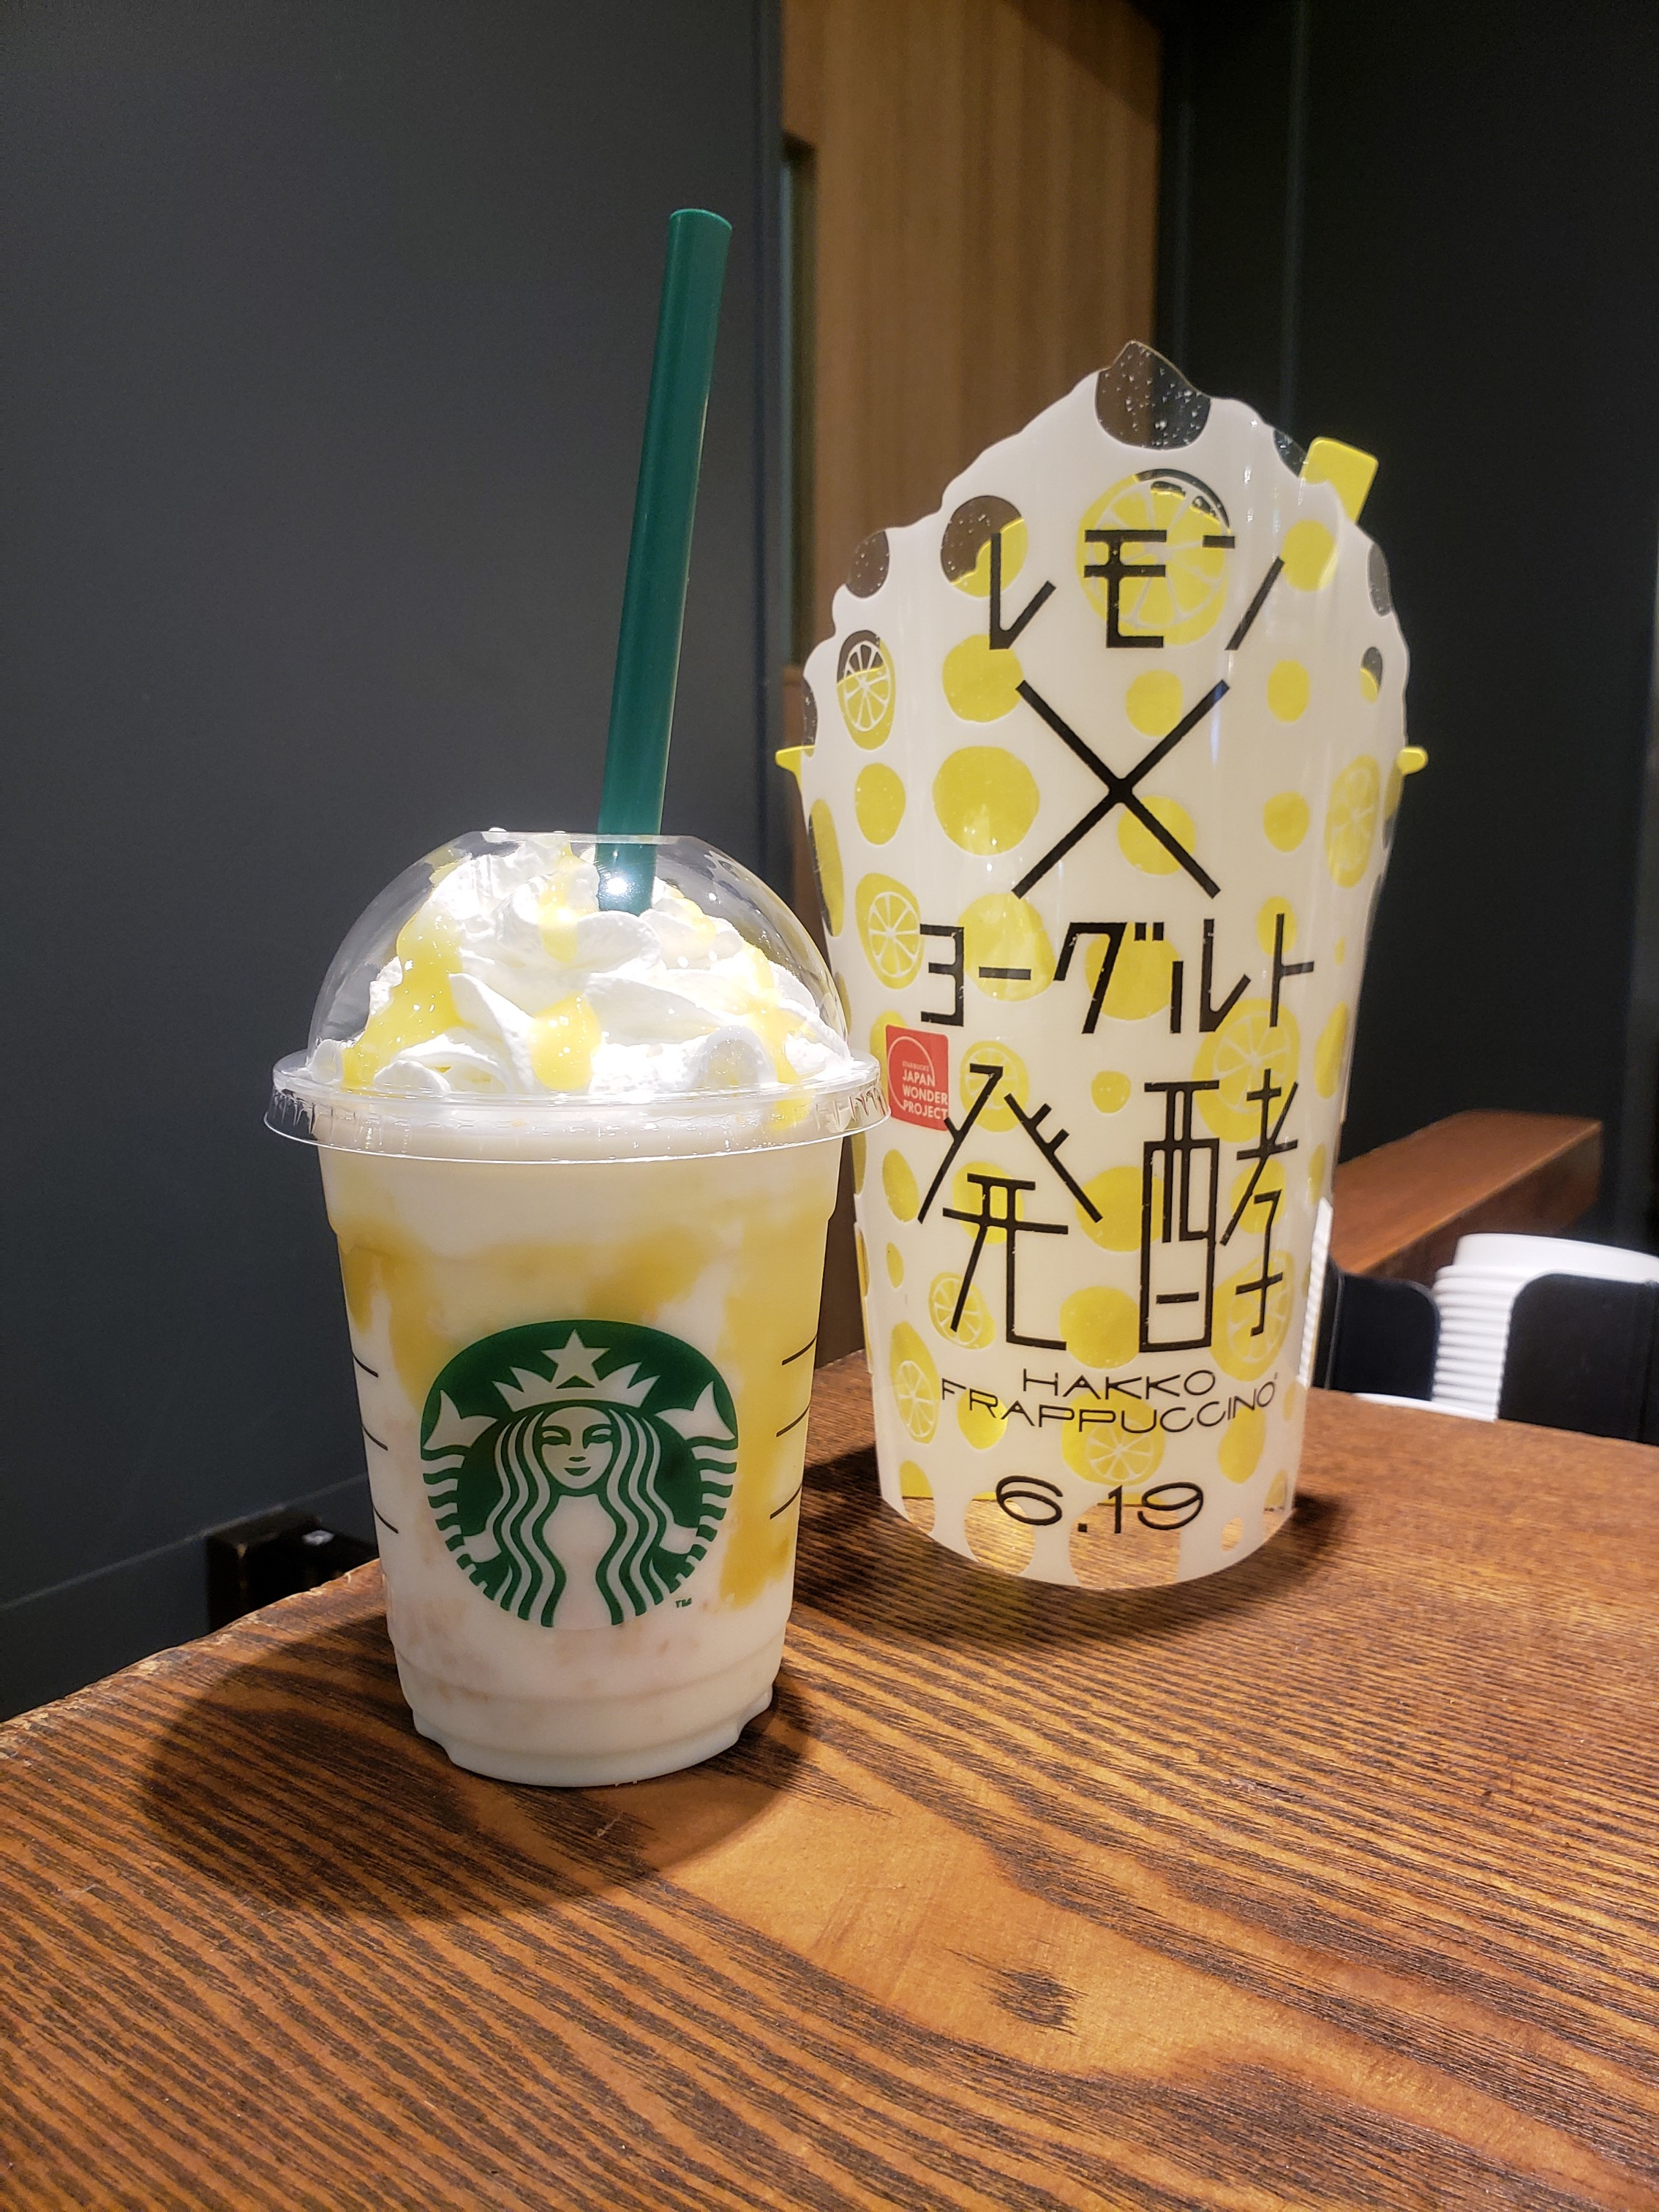 【STARBUCKS】6/19発売☆レモンヨーグルト発酵 フラペチーノは爽やかでまろやか!_1